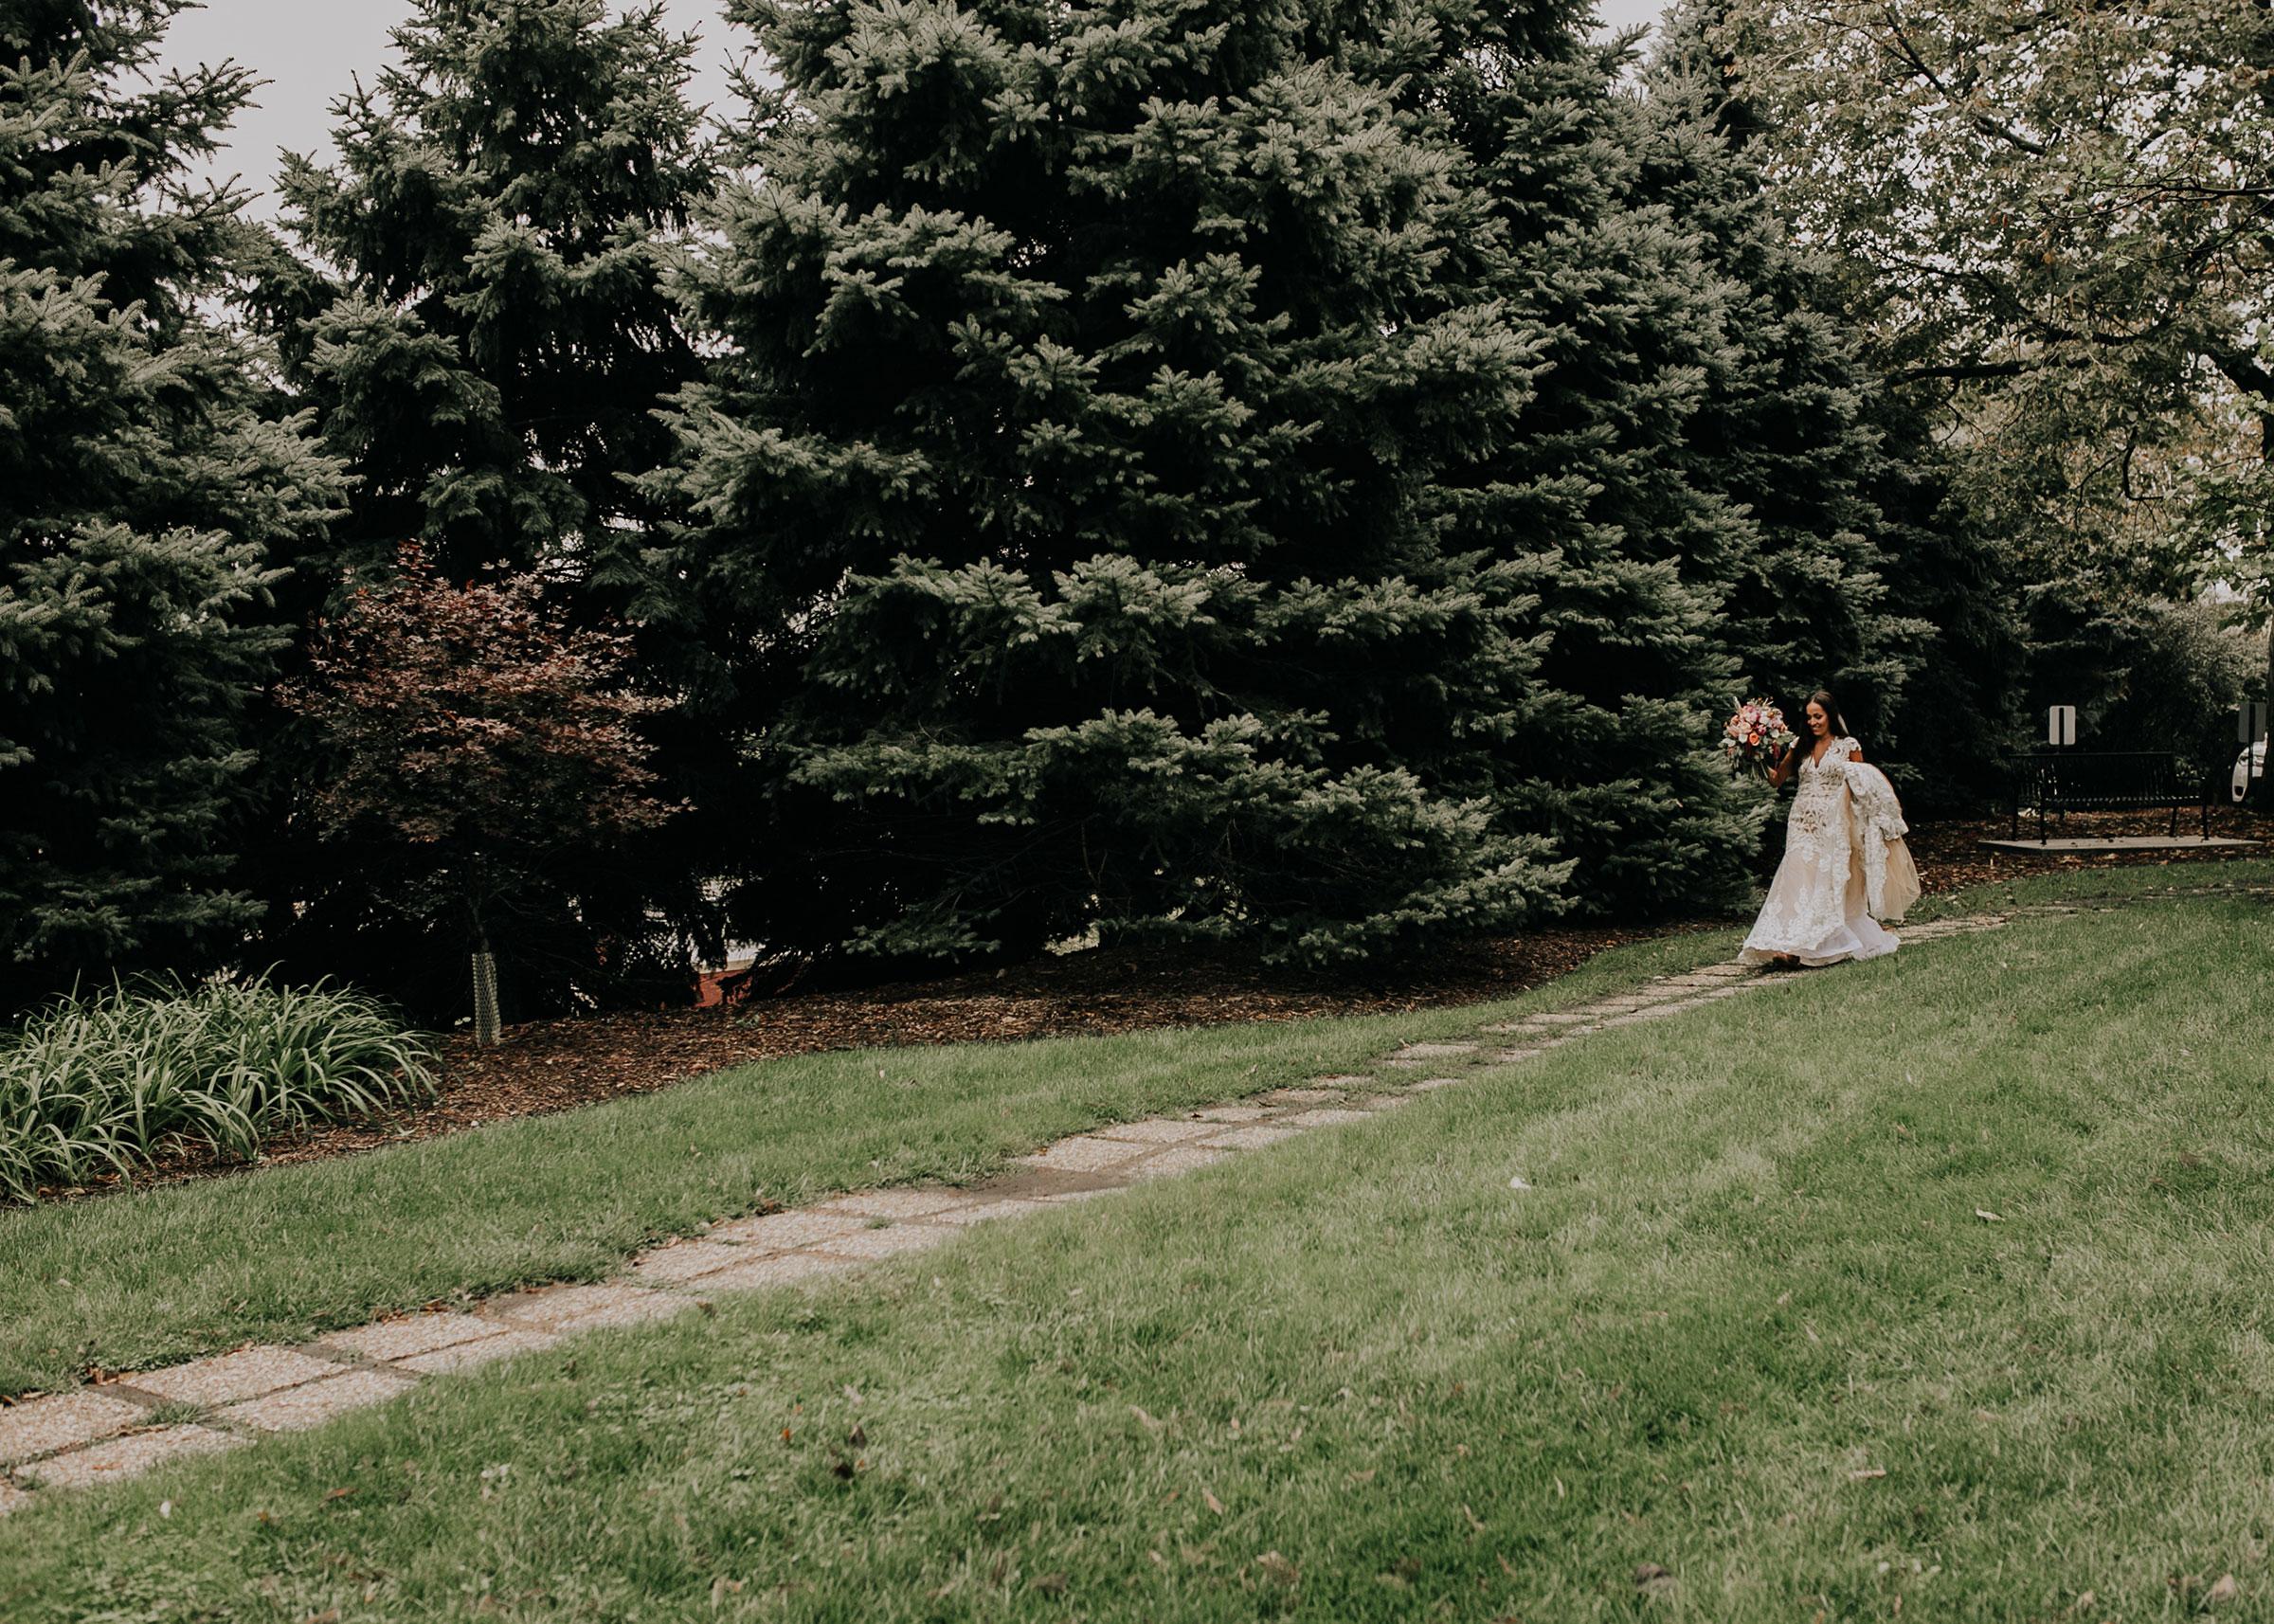 bride-walking-to-groom-for-first-look-st-johns-church-at-creighton-omaha-nebraska-raelyn-ramey-photography.jpg